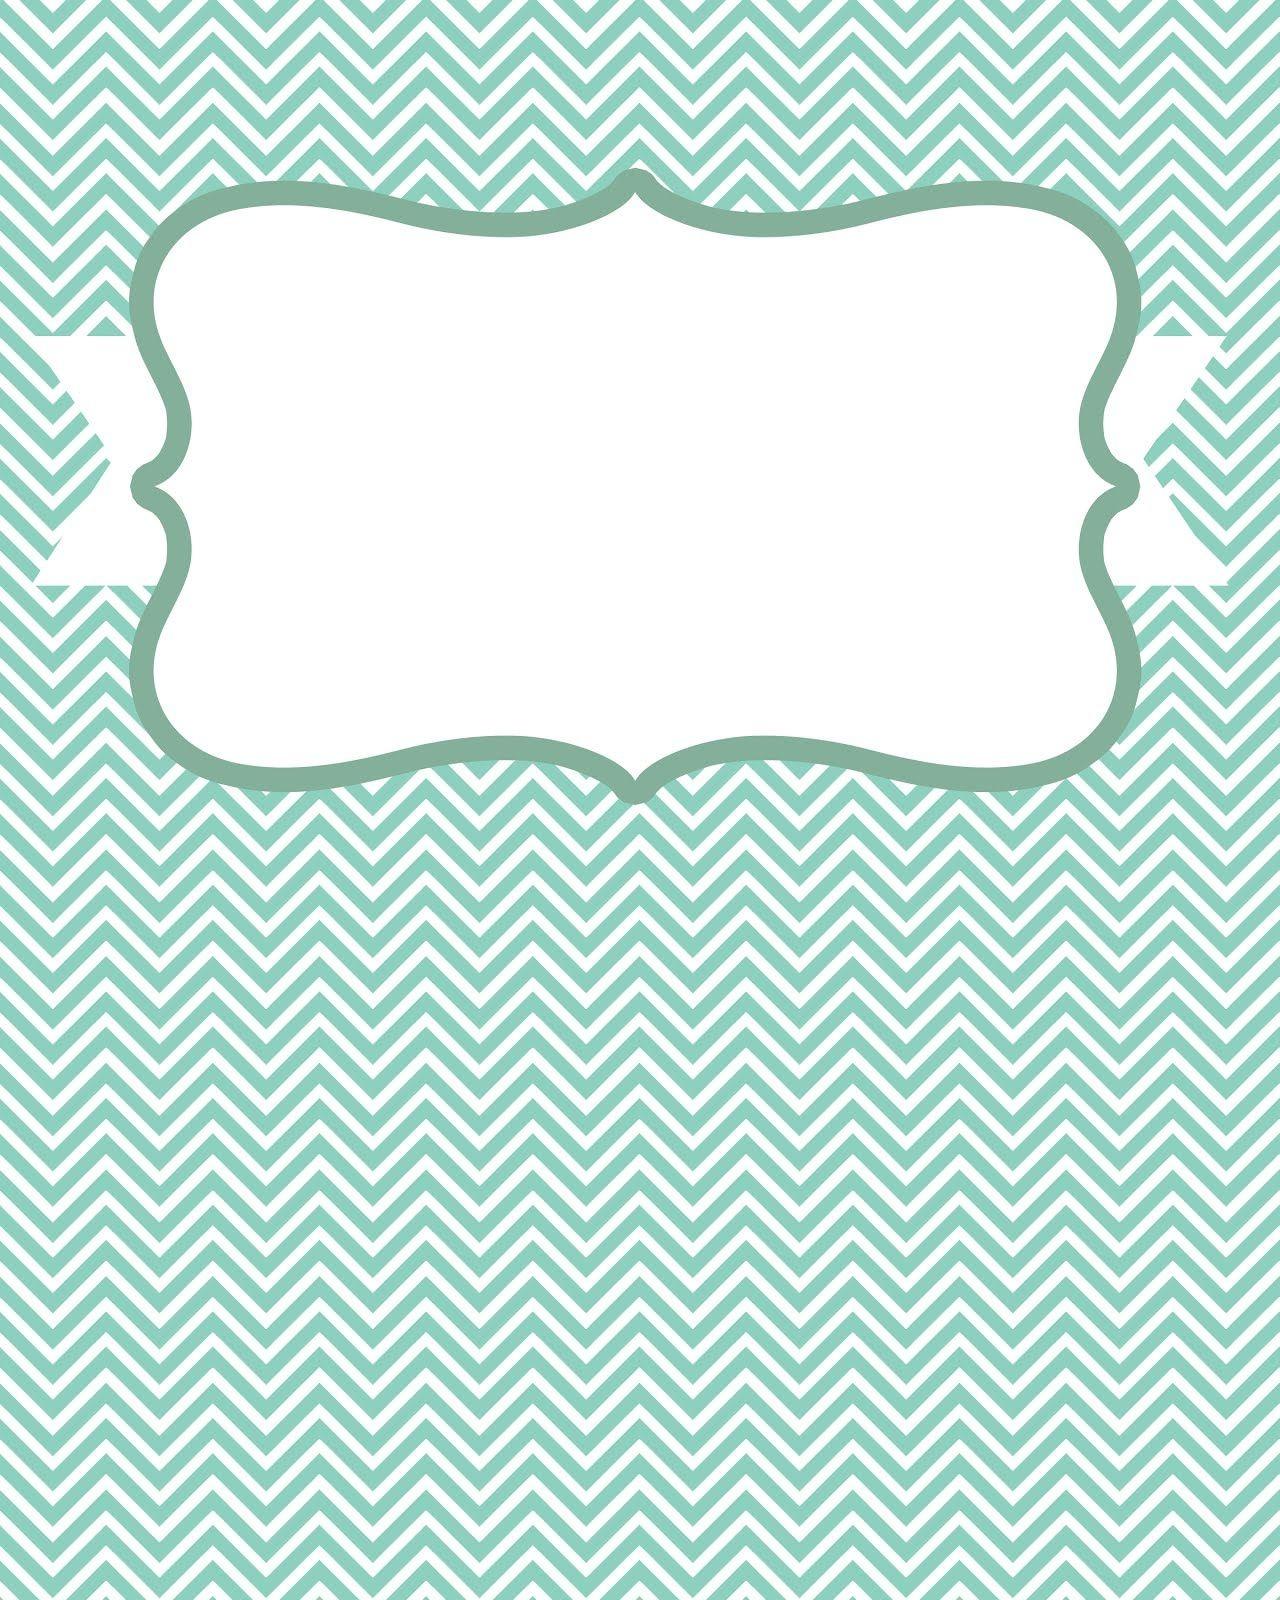 Binder Cover Templates Binder Cover Templates Lilly Pulitzer Binder - Free Printable Binder Cover Templates